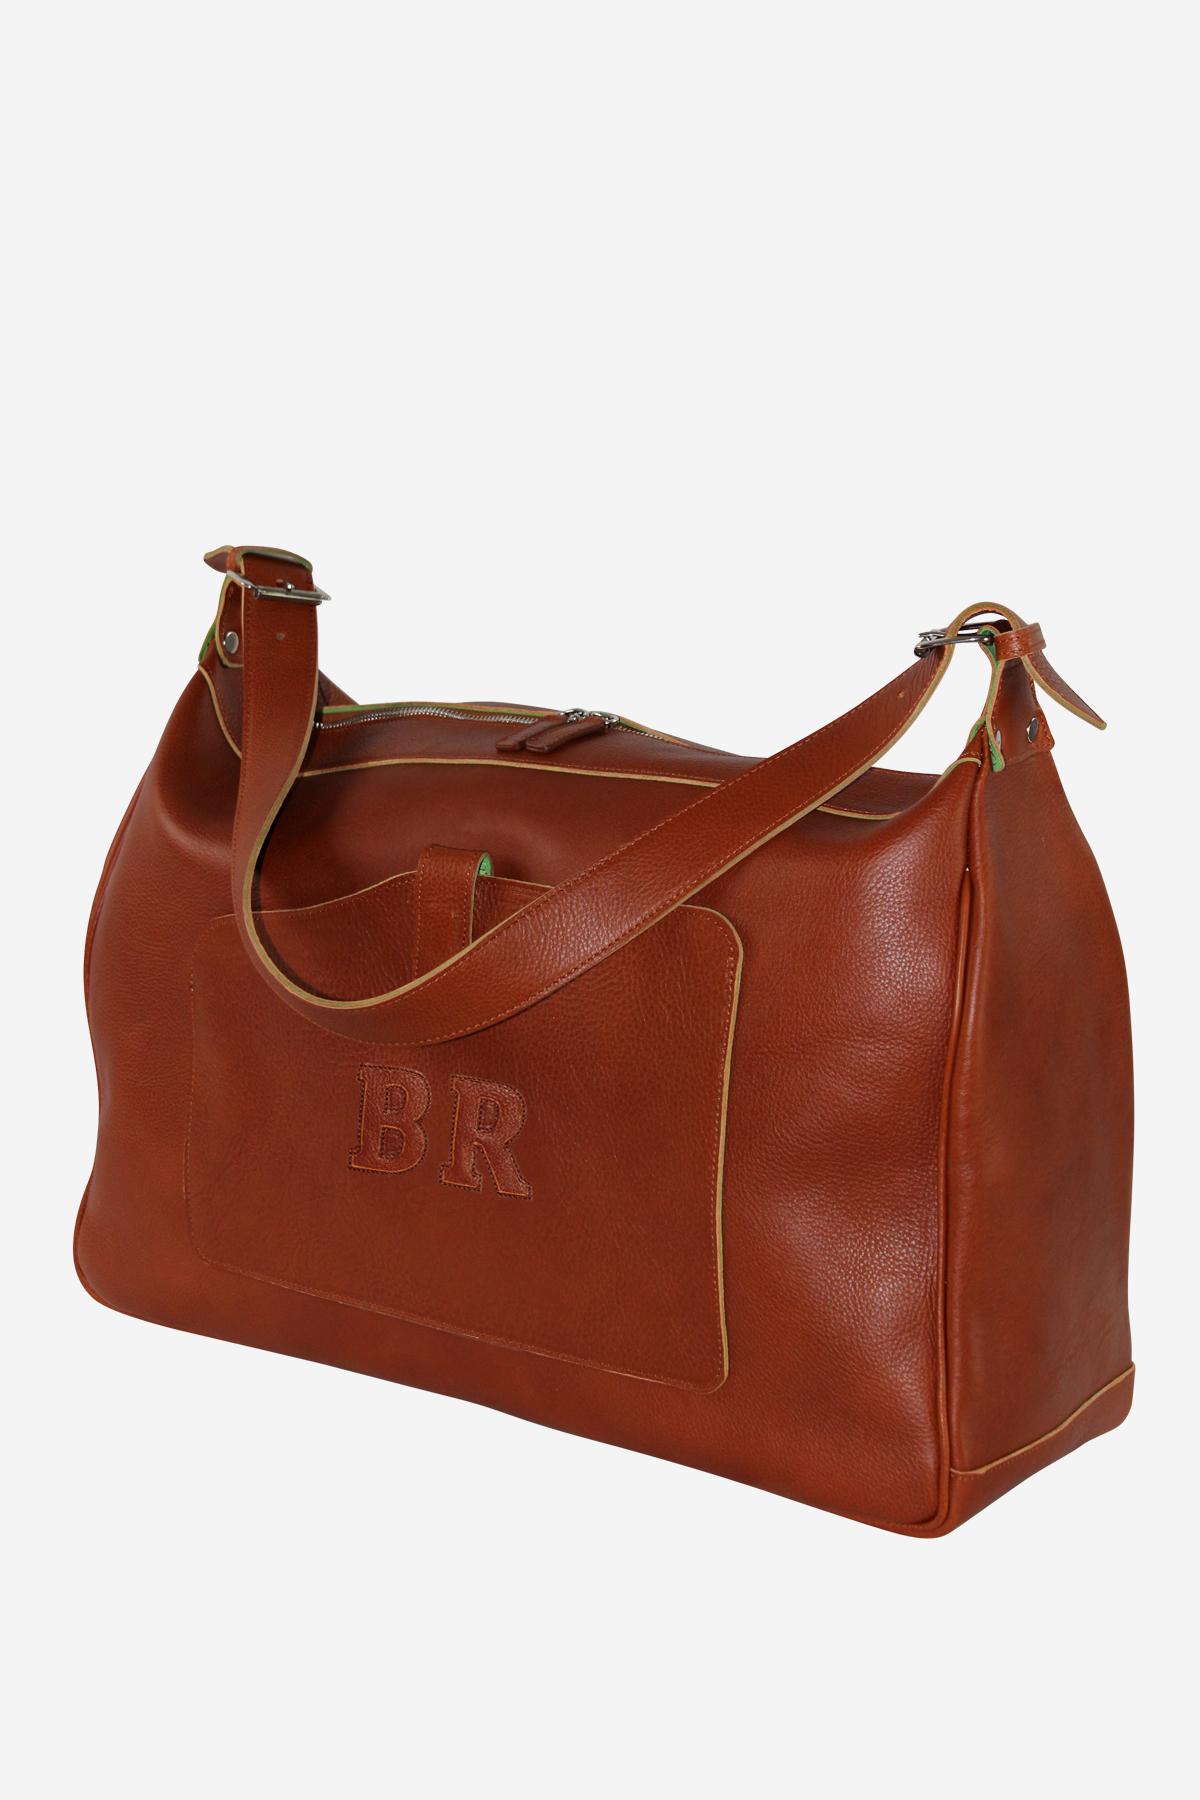 Modern Bag handmade in italy vegetable tanned leather terrida venezia italy business travel